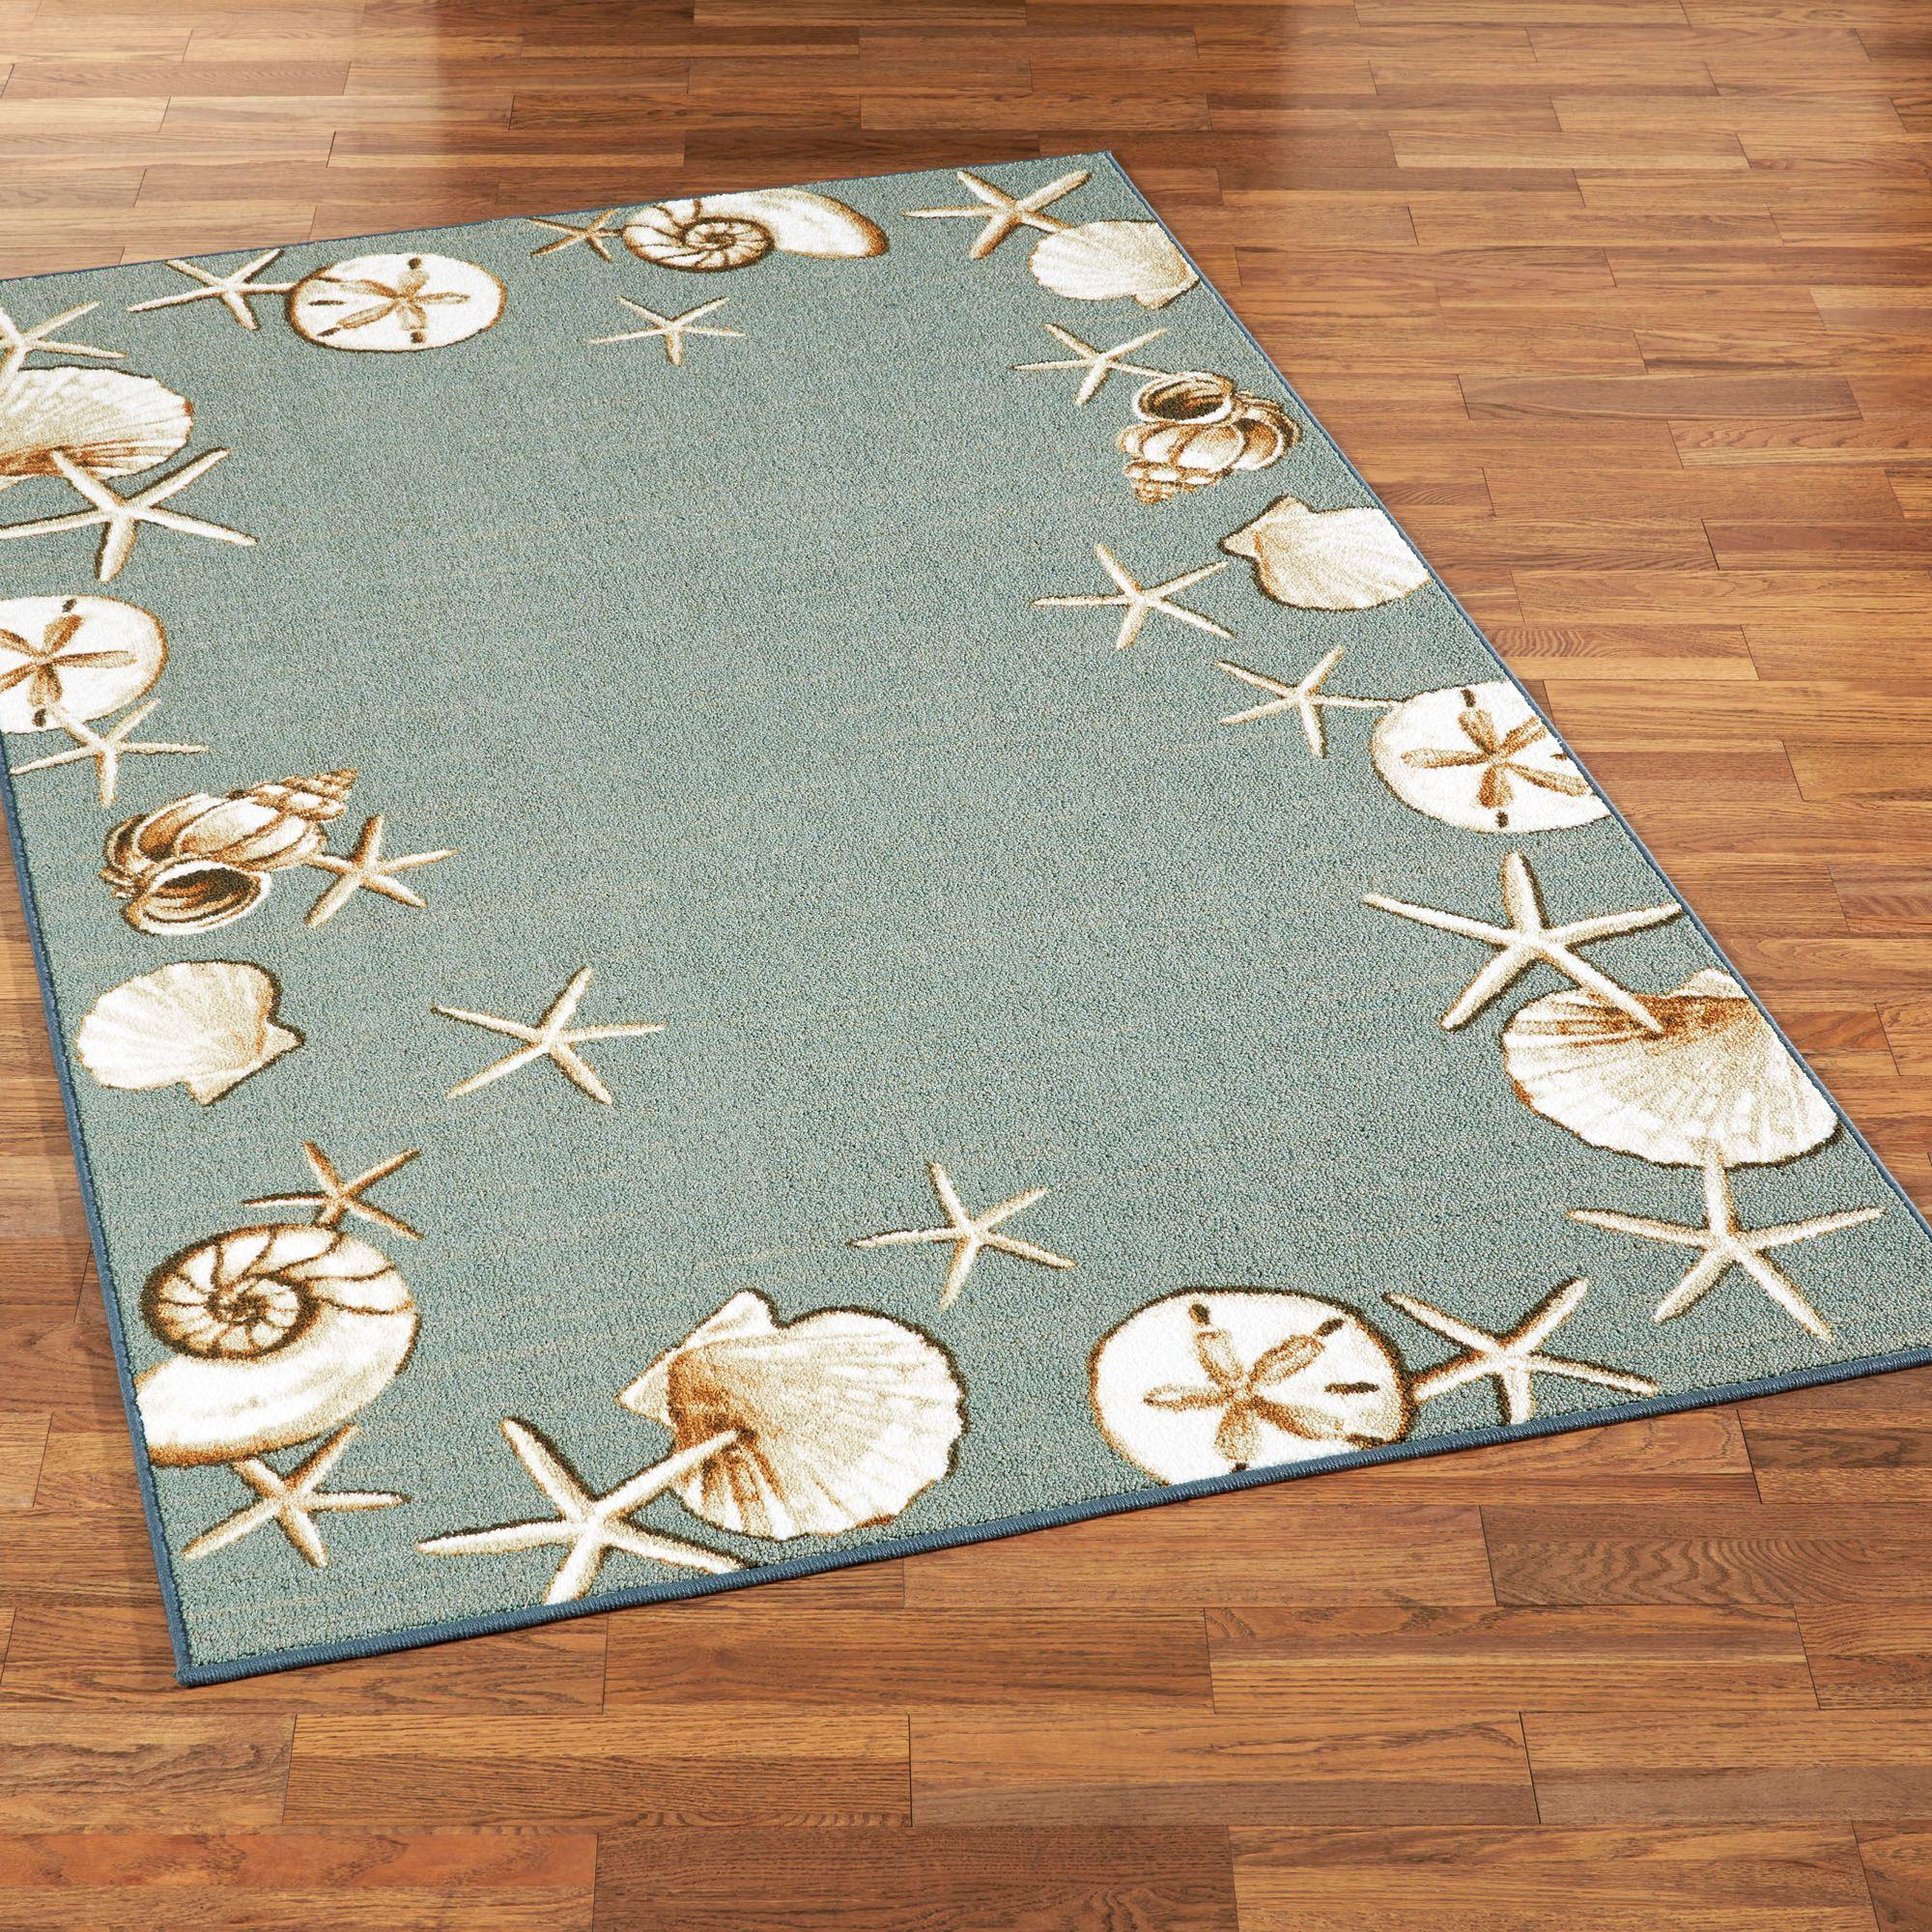 waimea bay seashell area rugs | beach house decor☀ | pinterest